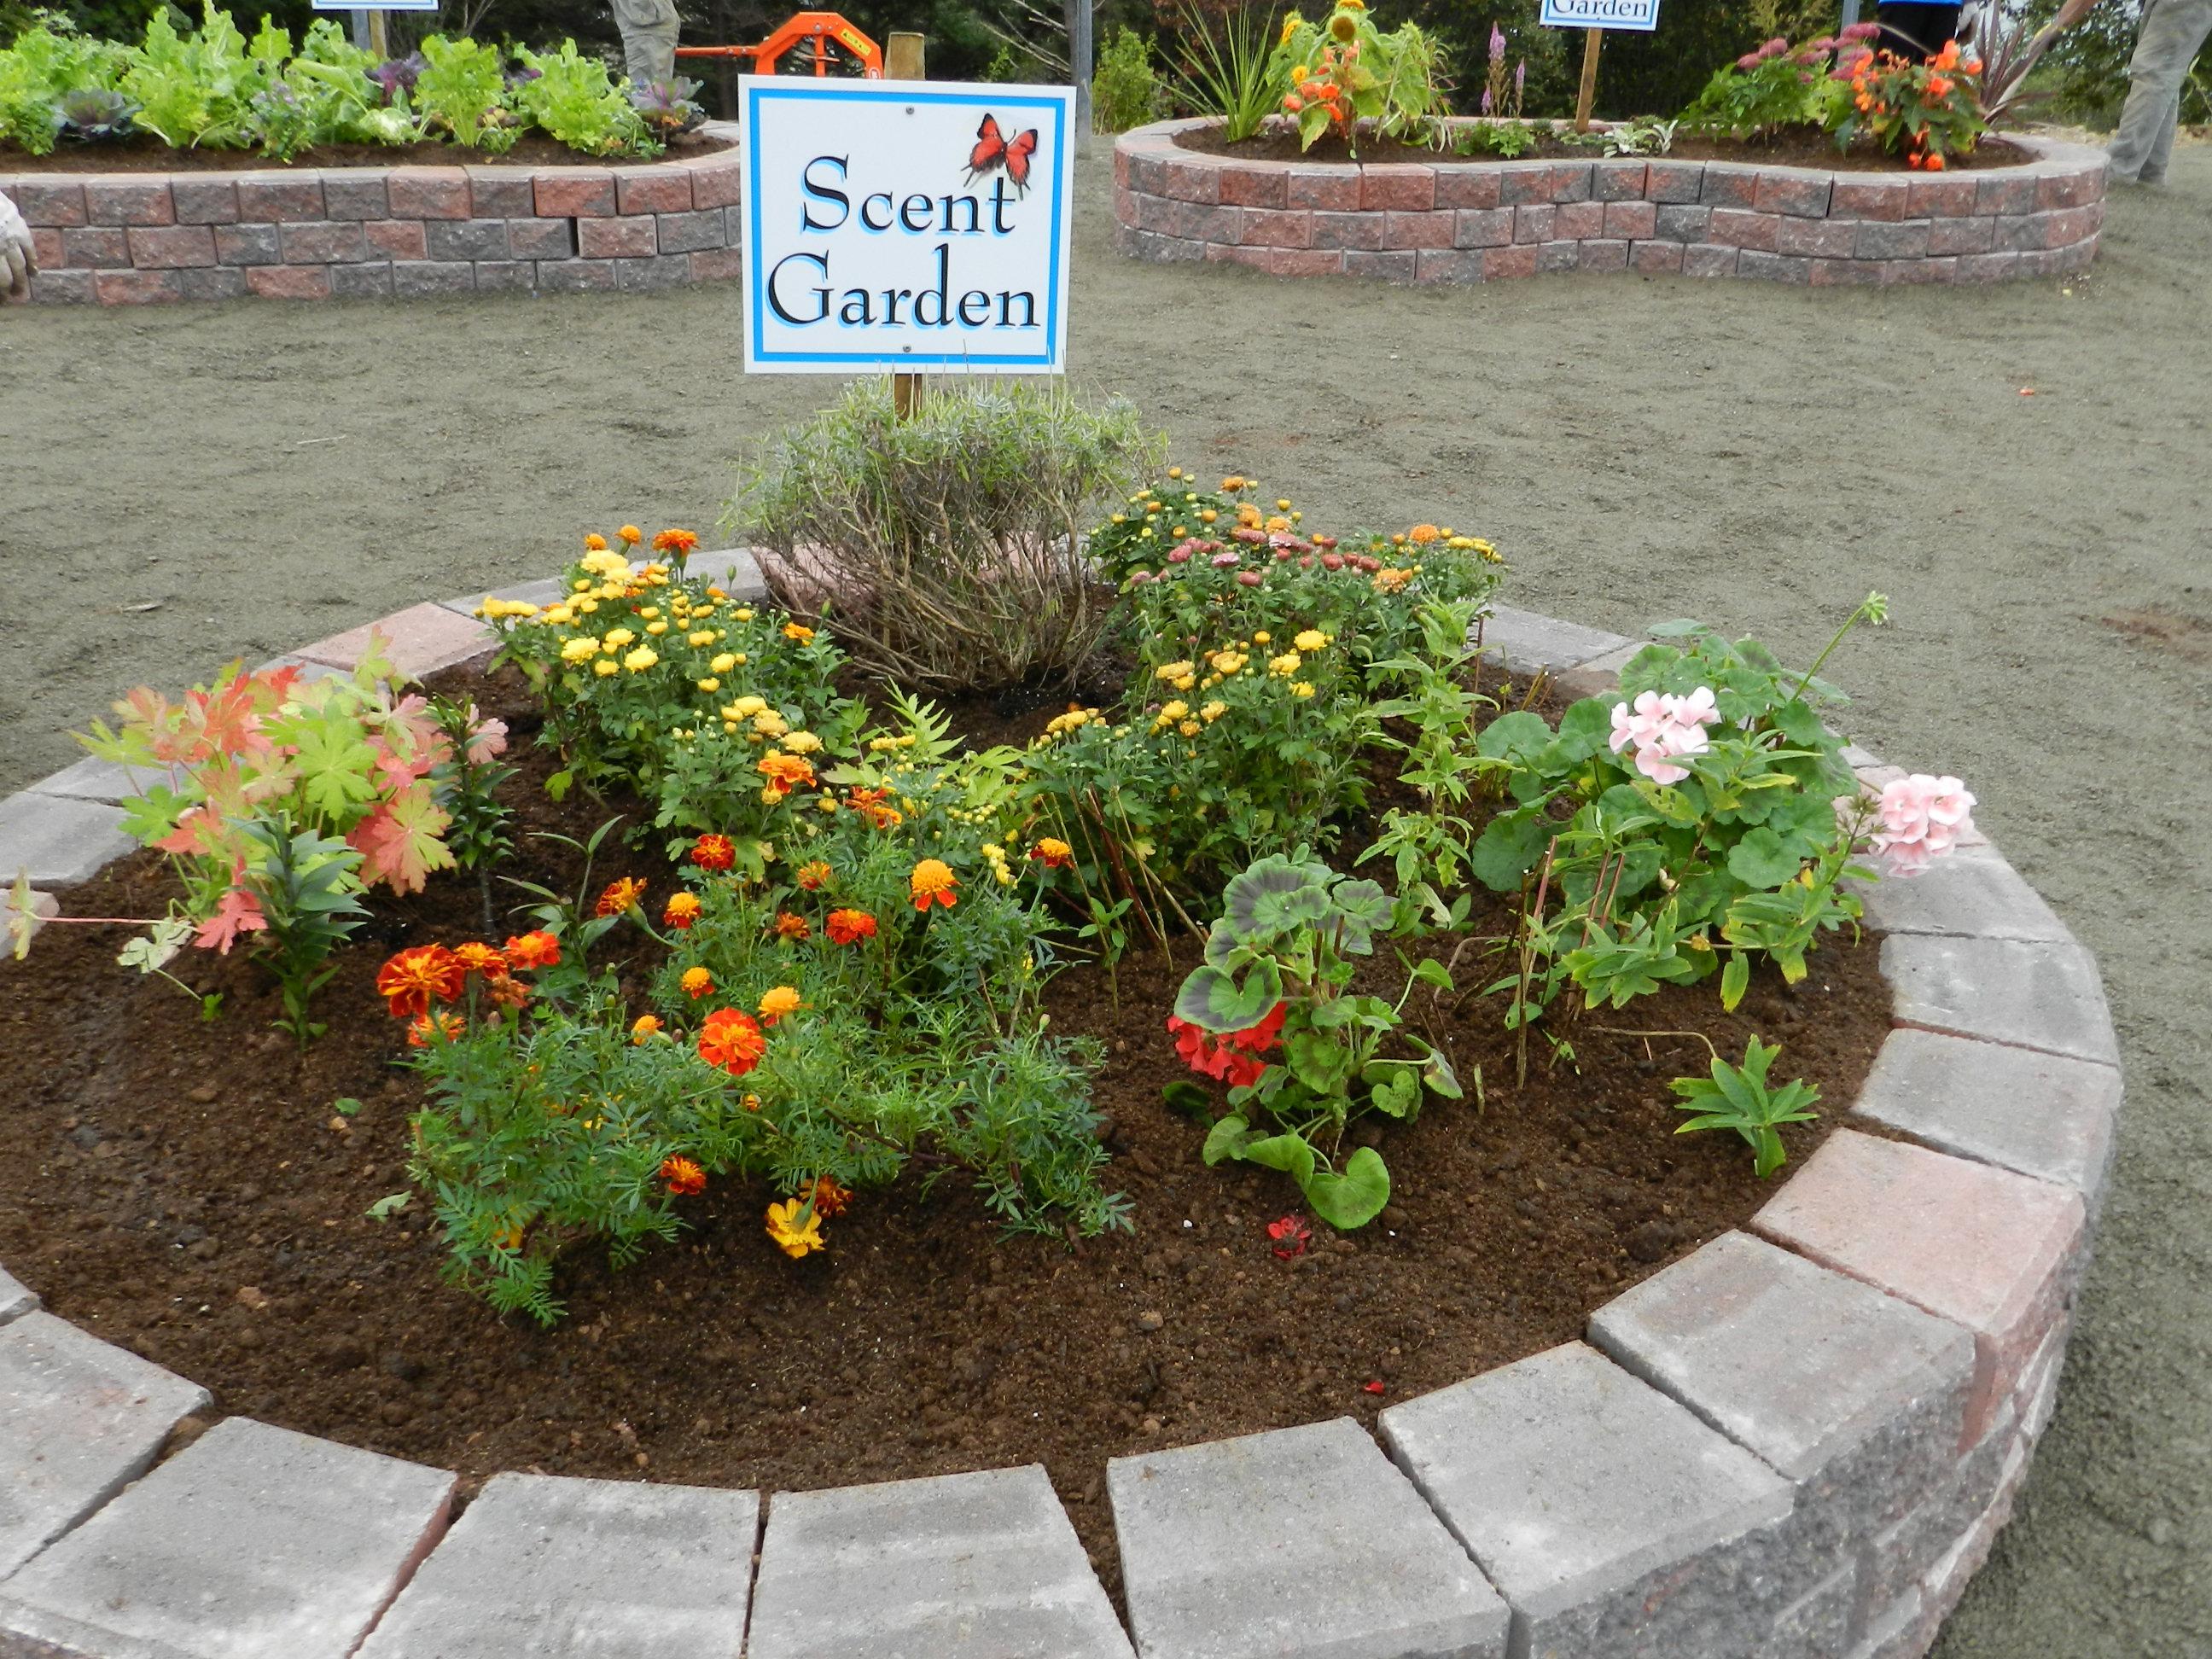 Scent Garden Sensory Garden Ideas Pinterest Sensory Garden